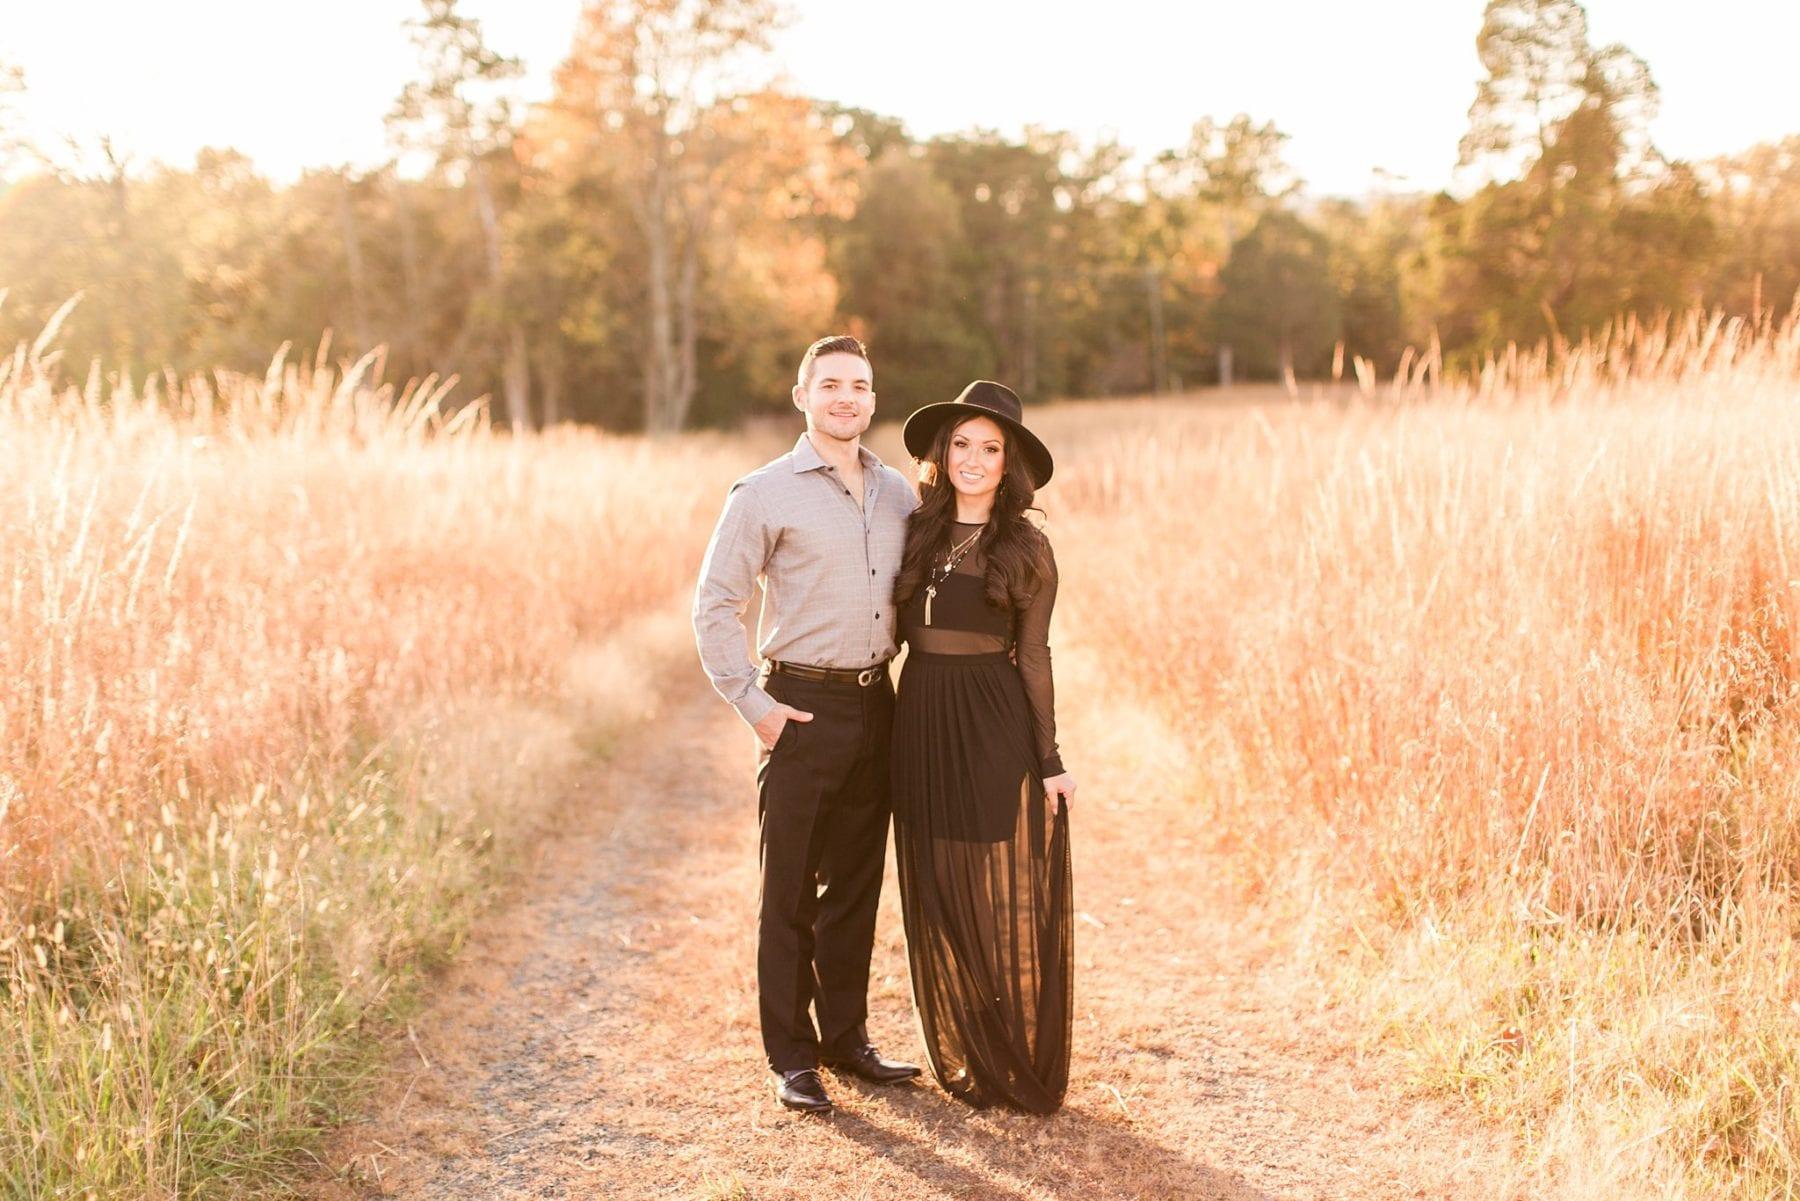 Manassas Battlefield Portraits Virginia Wedding Photographer Megan Kelsey Photography Lianne & Chris-154.jpg